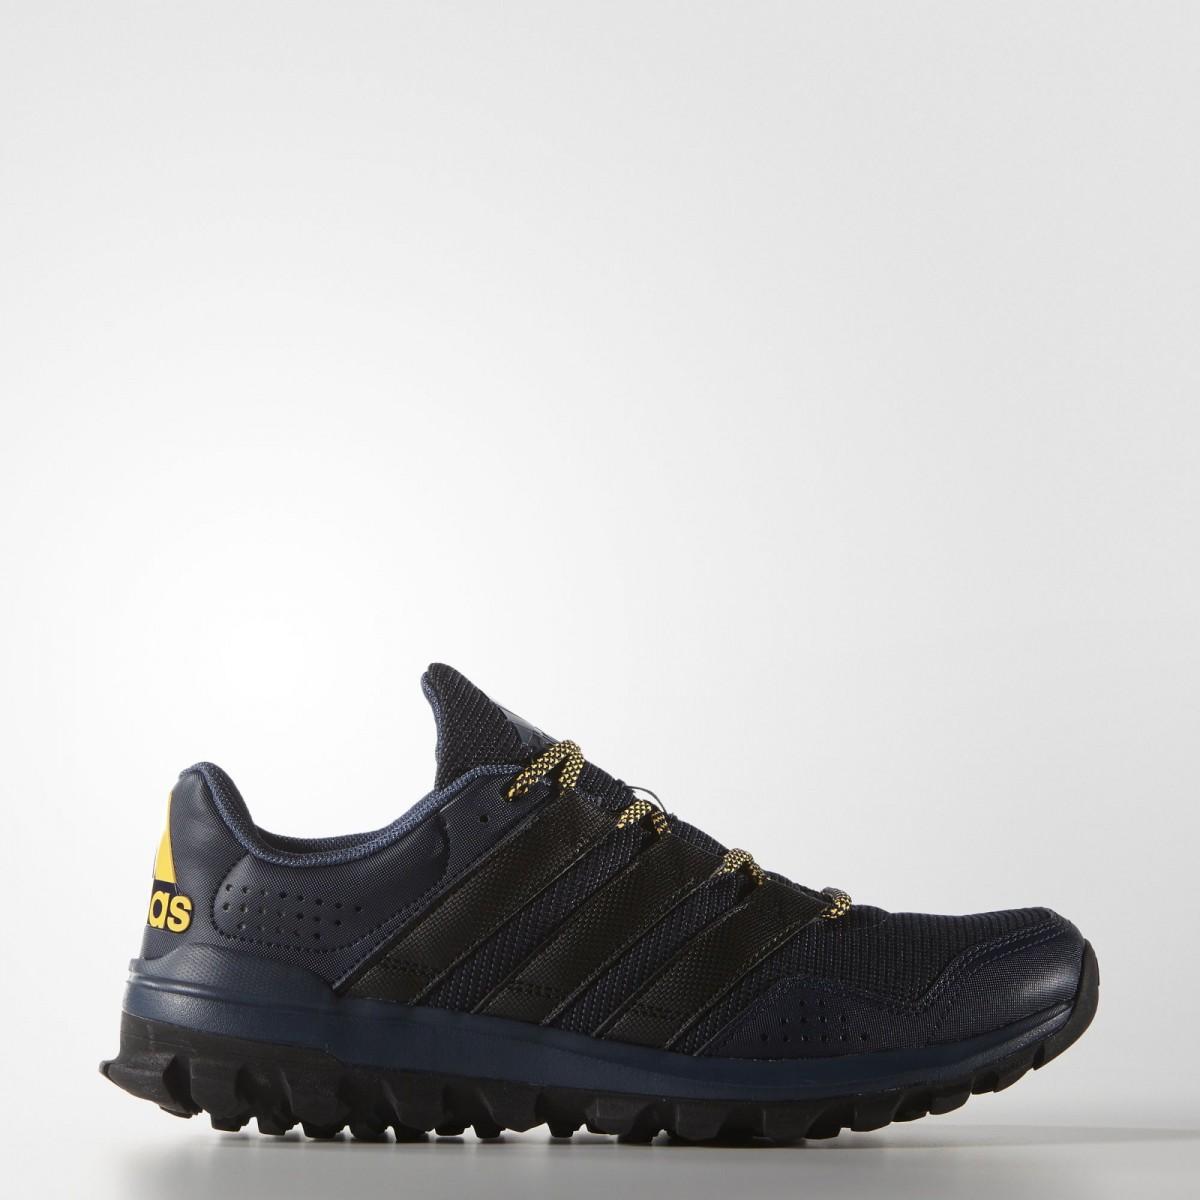 35eaee8c9 Bizz Store - Tênis Masculino Adidas Slingshot Trail Corrida